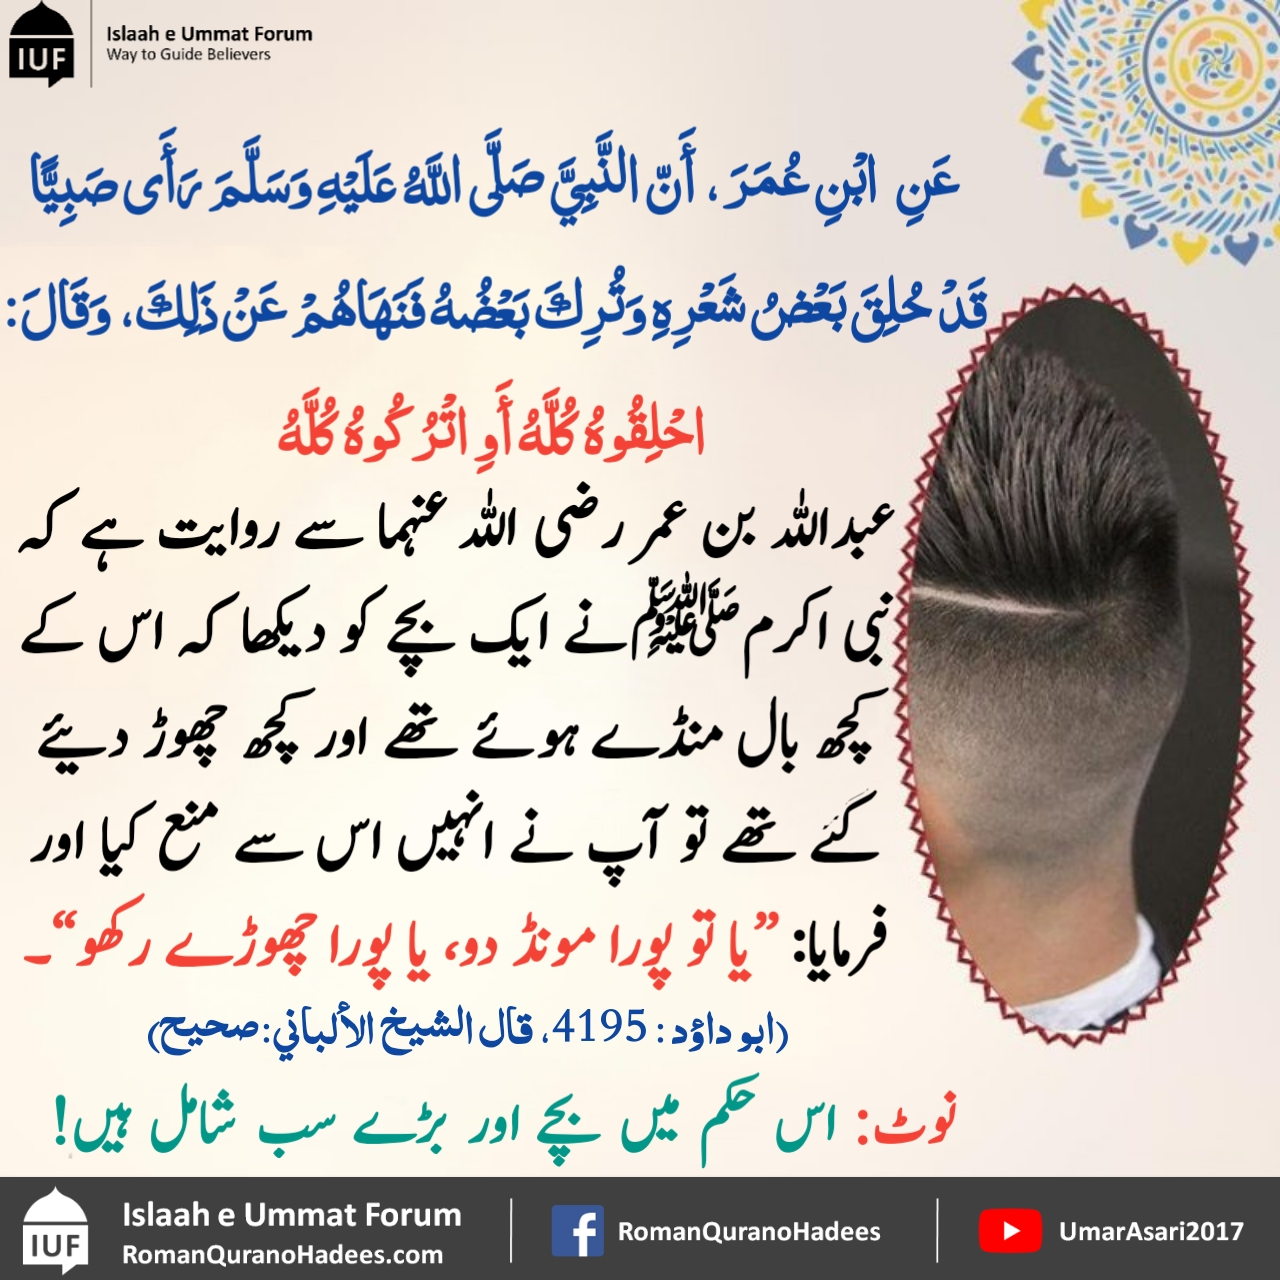 Qaza 1 (Urdu).jpg